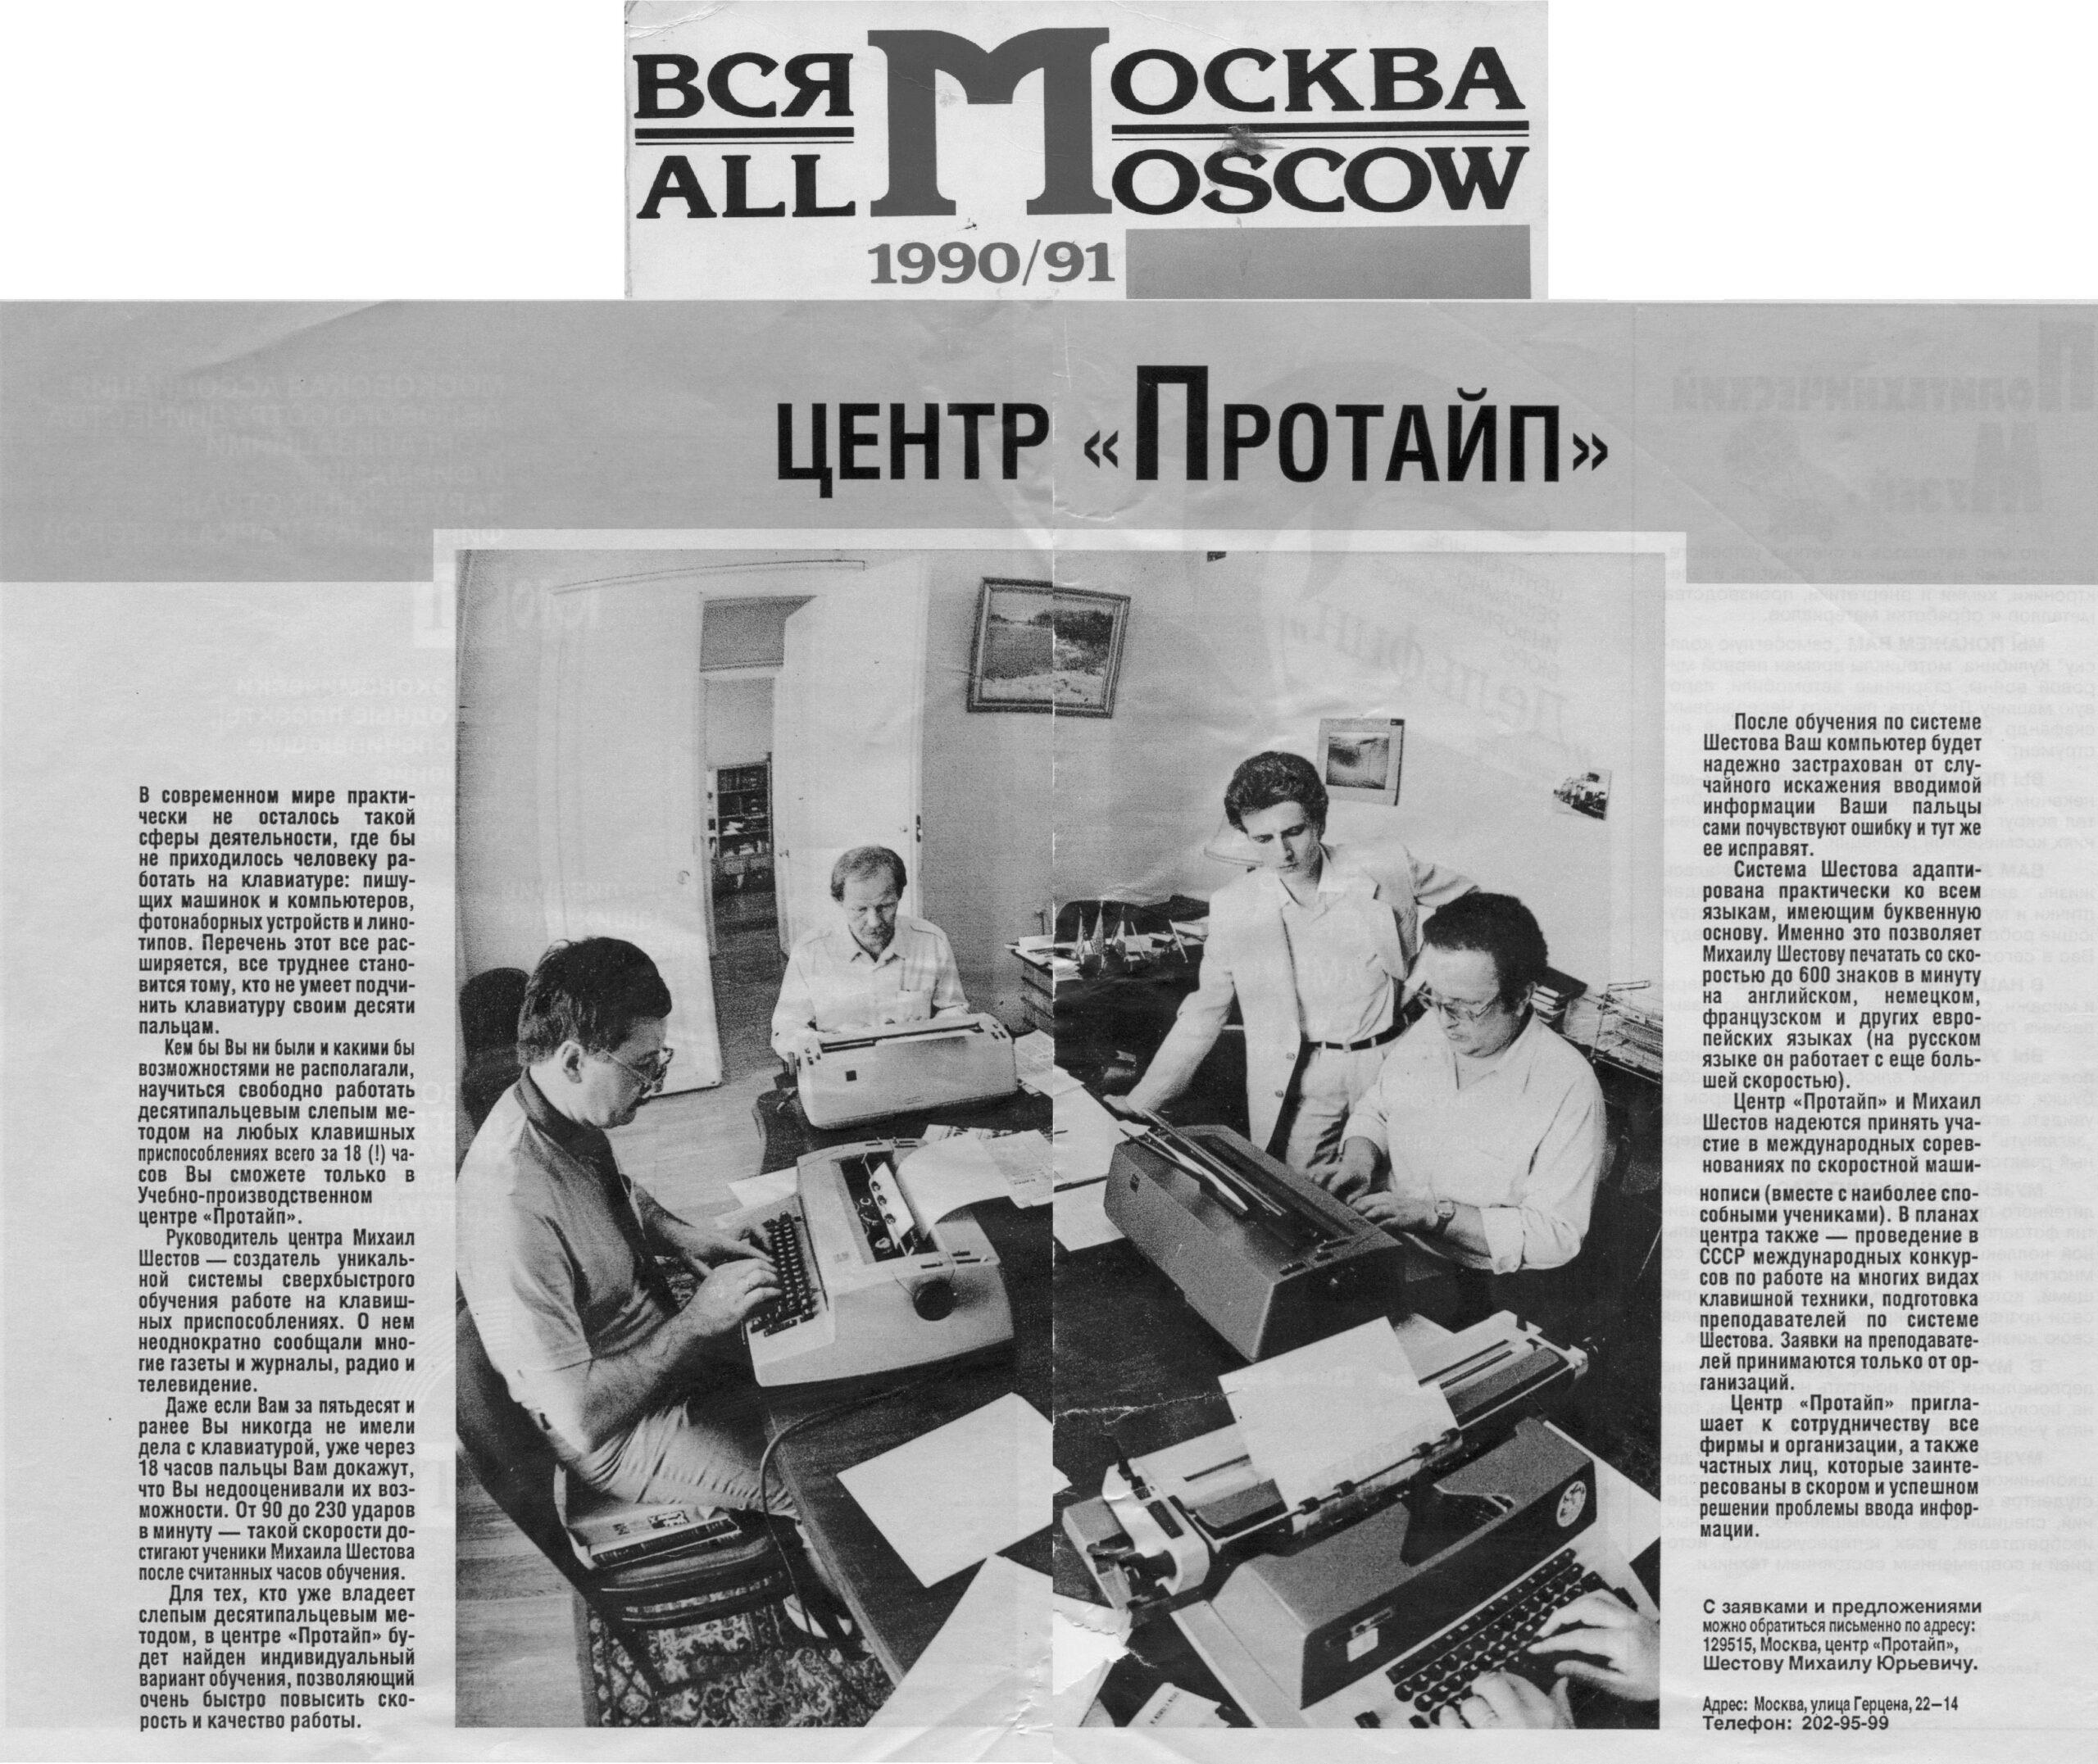 «Вся Москва», 1990